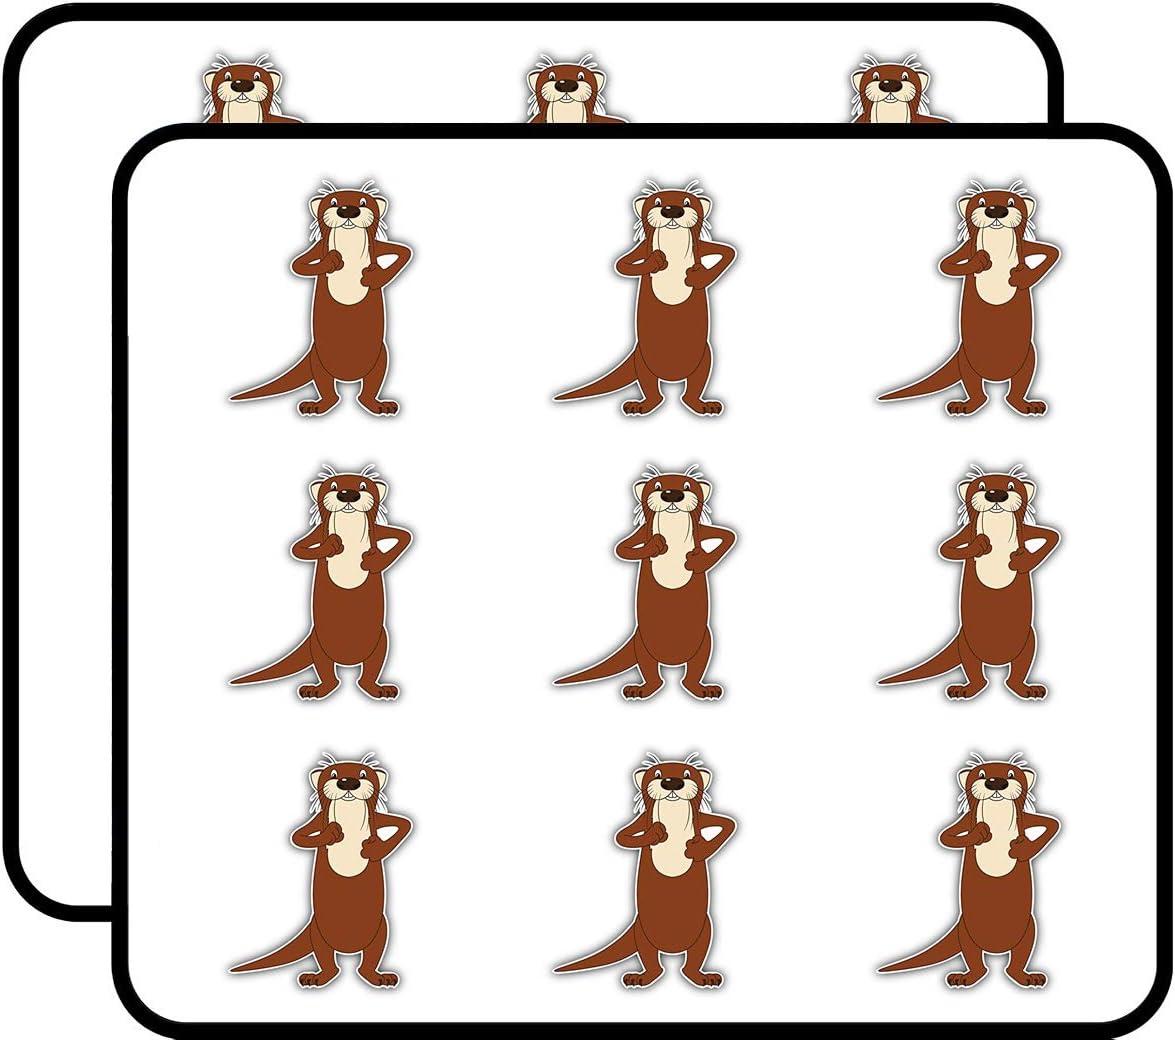 Funny Cartoon River Otter Art Decor 2